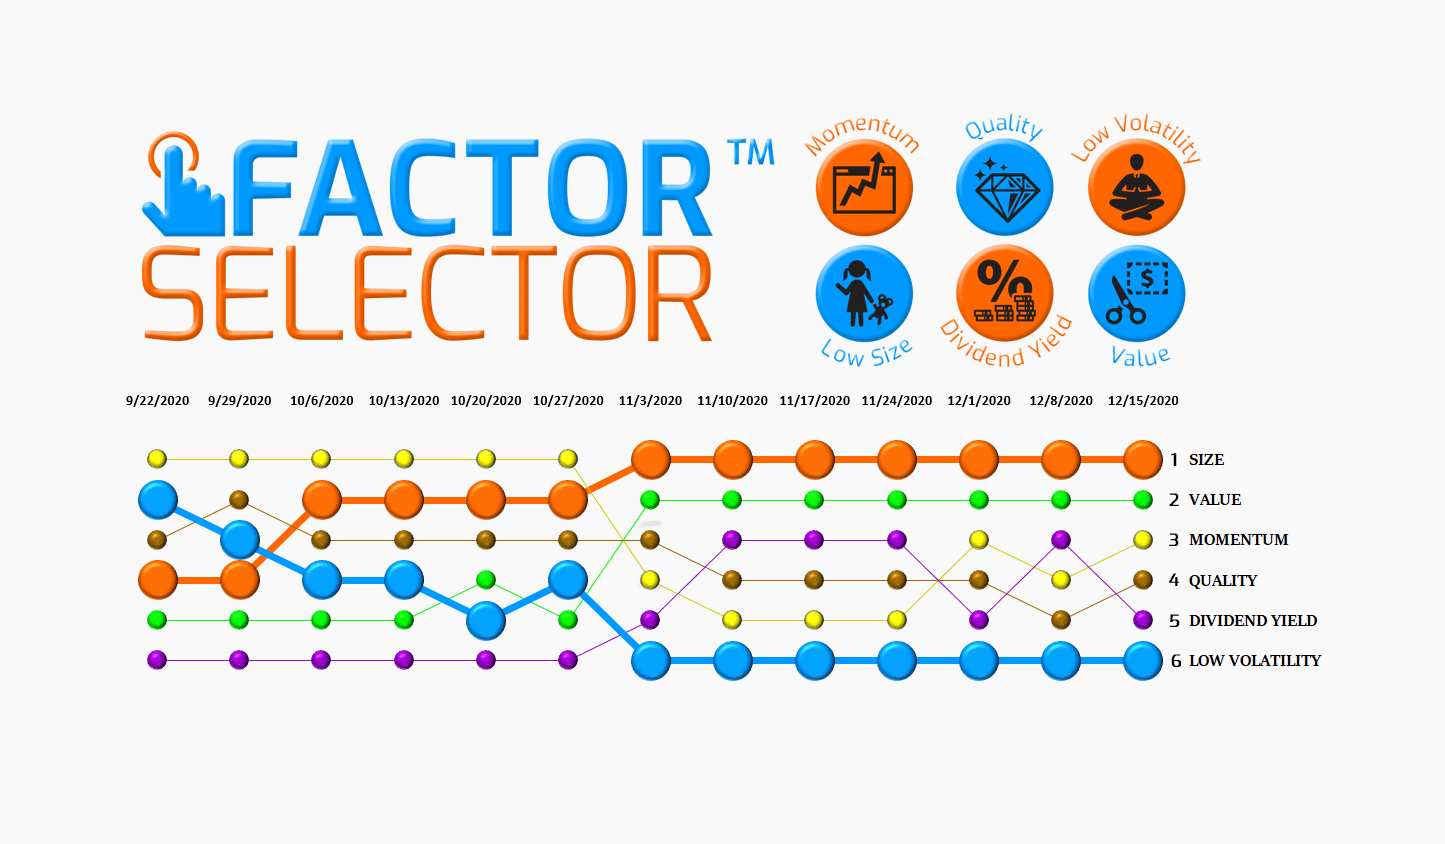 Factor Selector™  – 12/16/20 via @https://www.pinterest.com/market_scholars